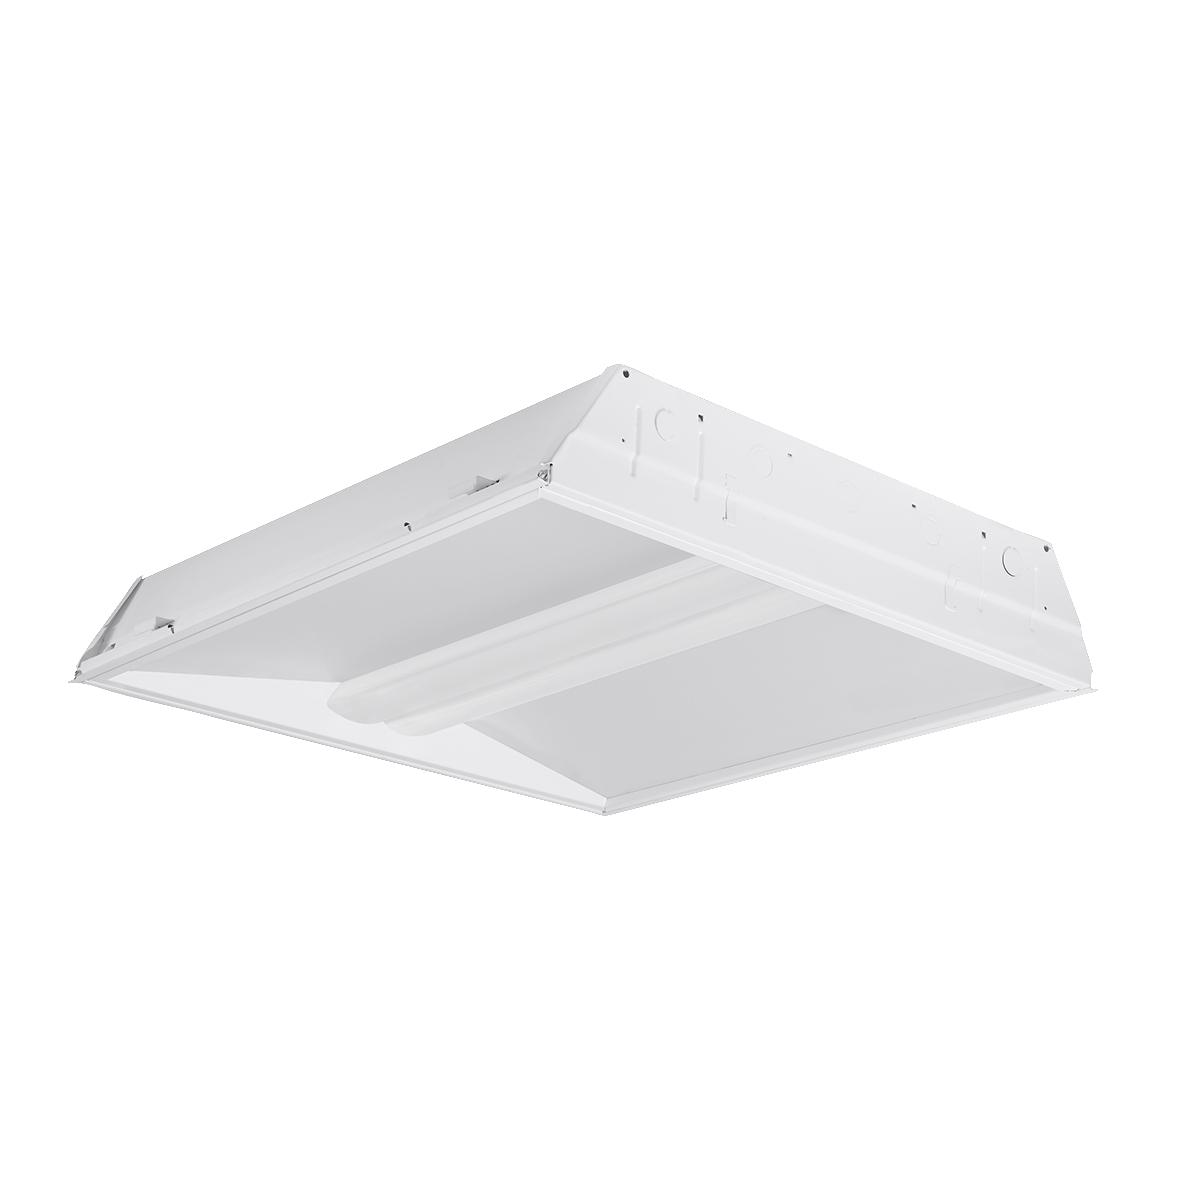 hblrla22 40hlg edu recessed led architectural luminaire size 2 ft x 2 ft